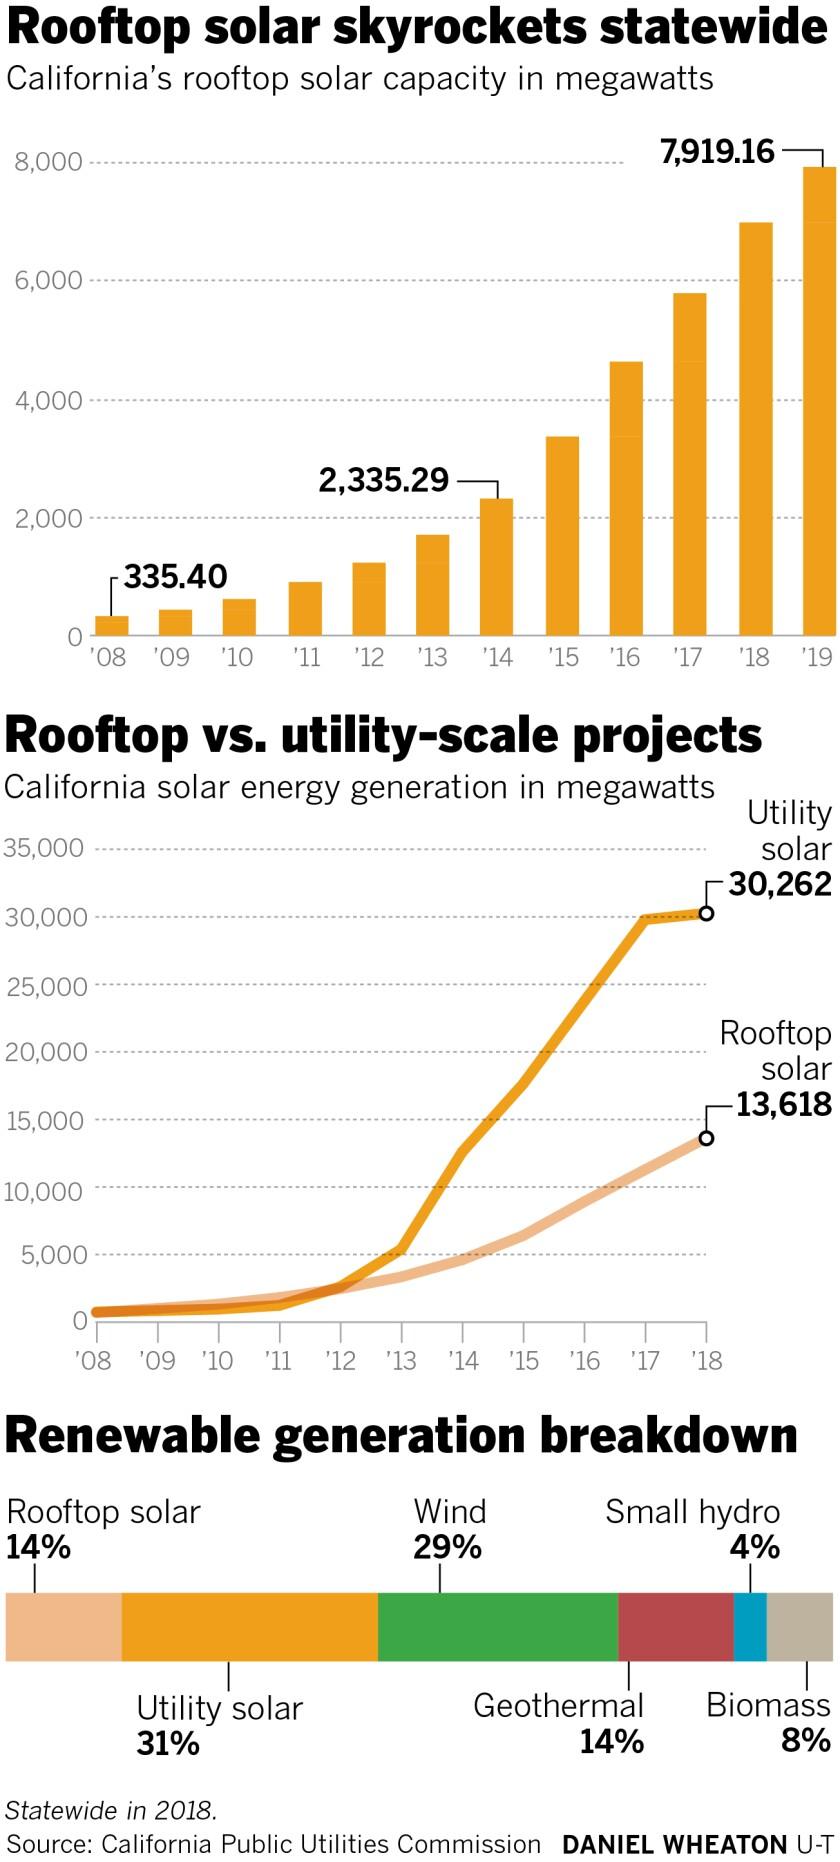 475114-w1-sd-me-g-solar-wars-graphs.jpg